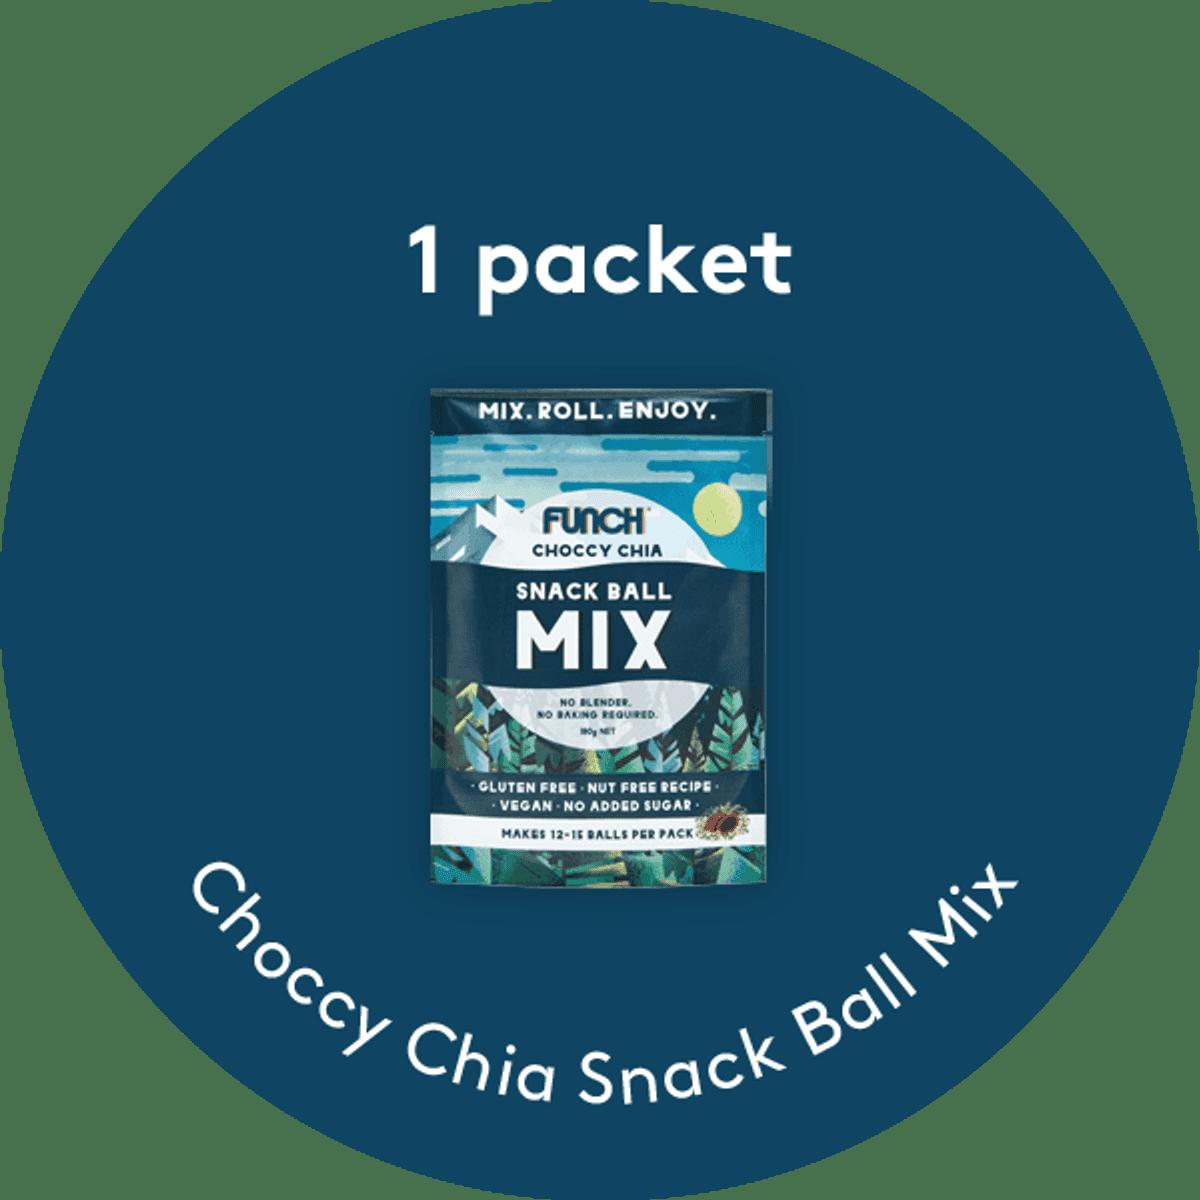 Choccy Chia Snack Ball Mix